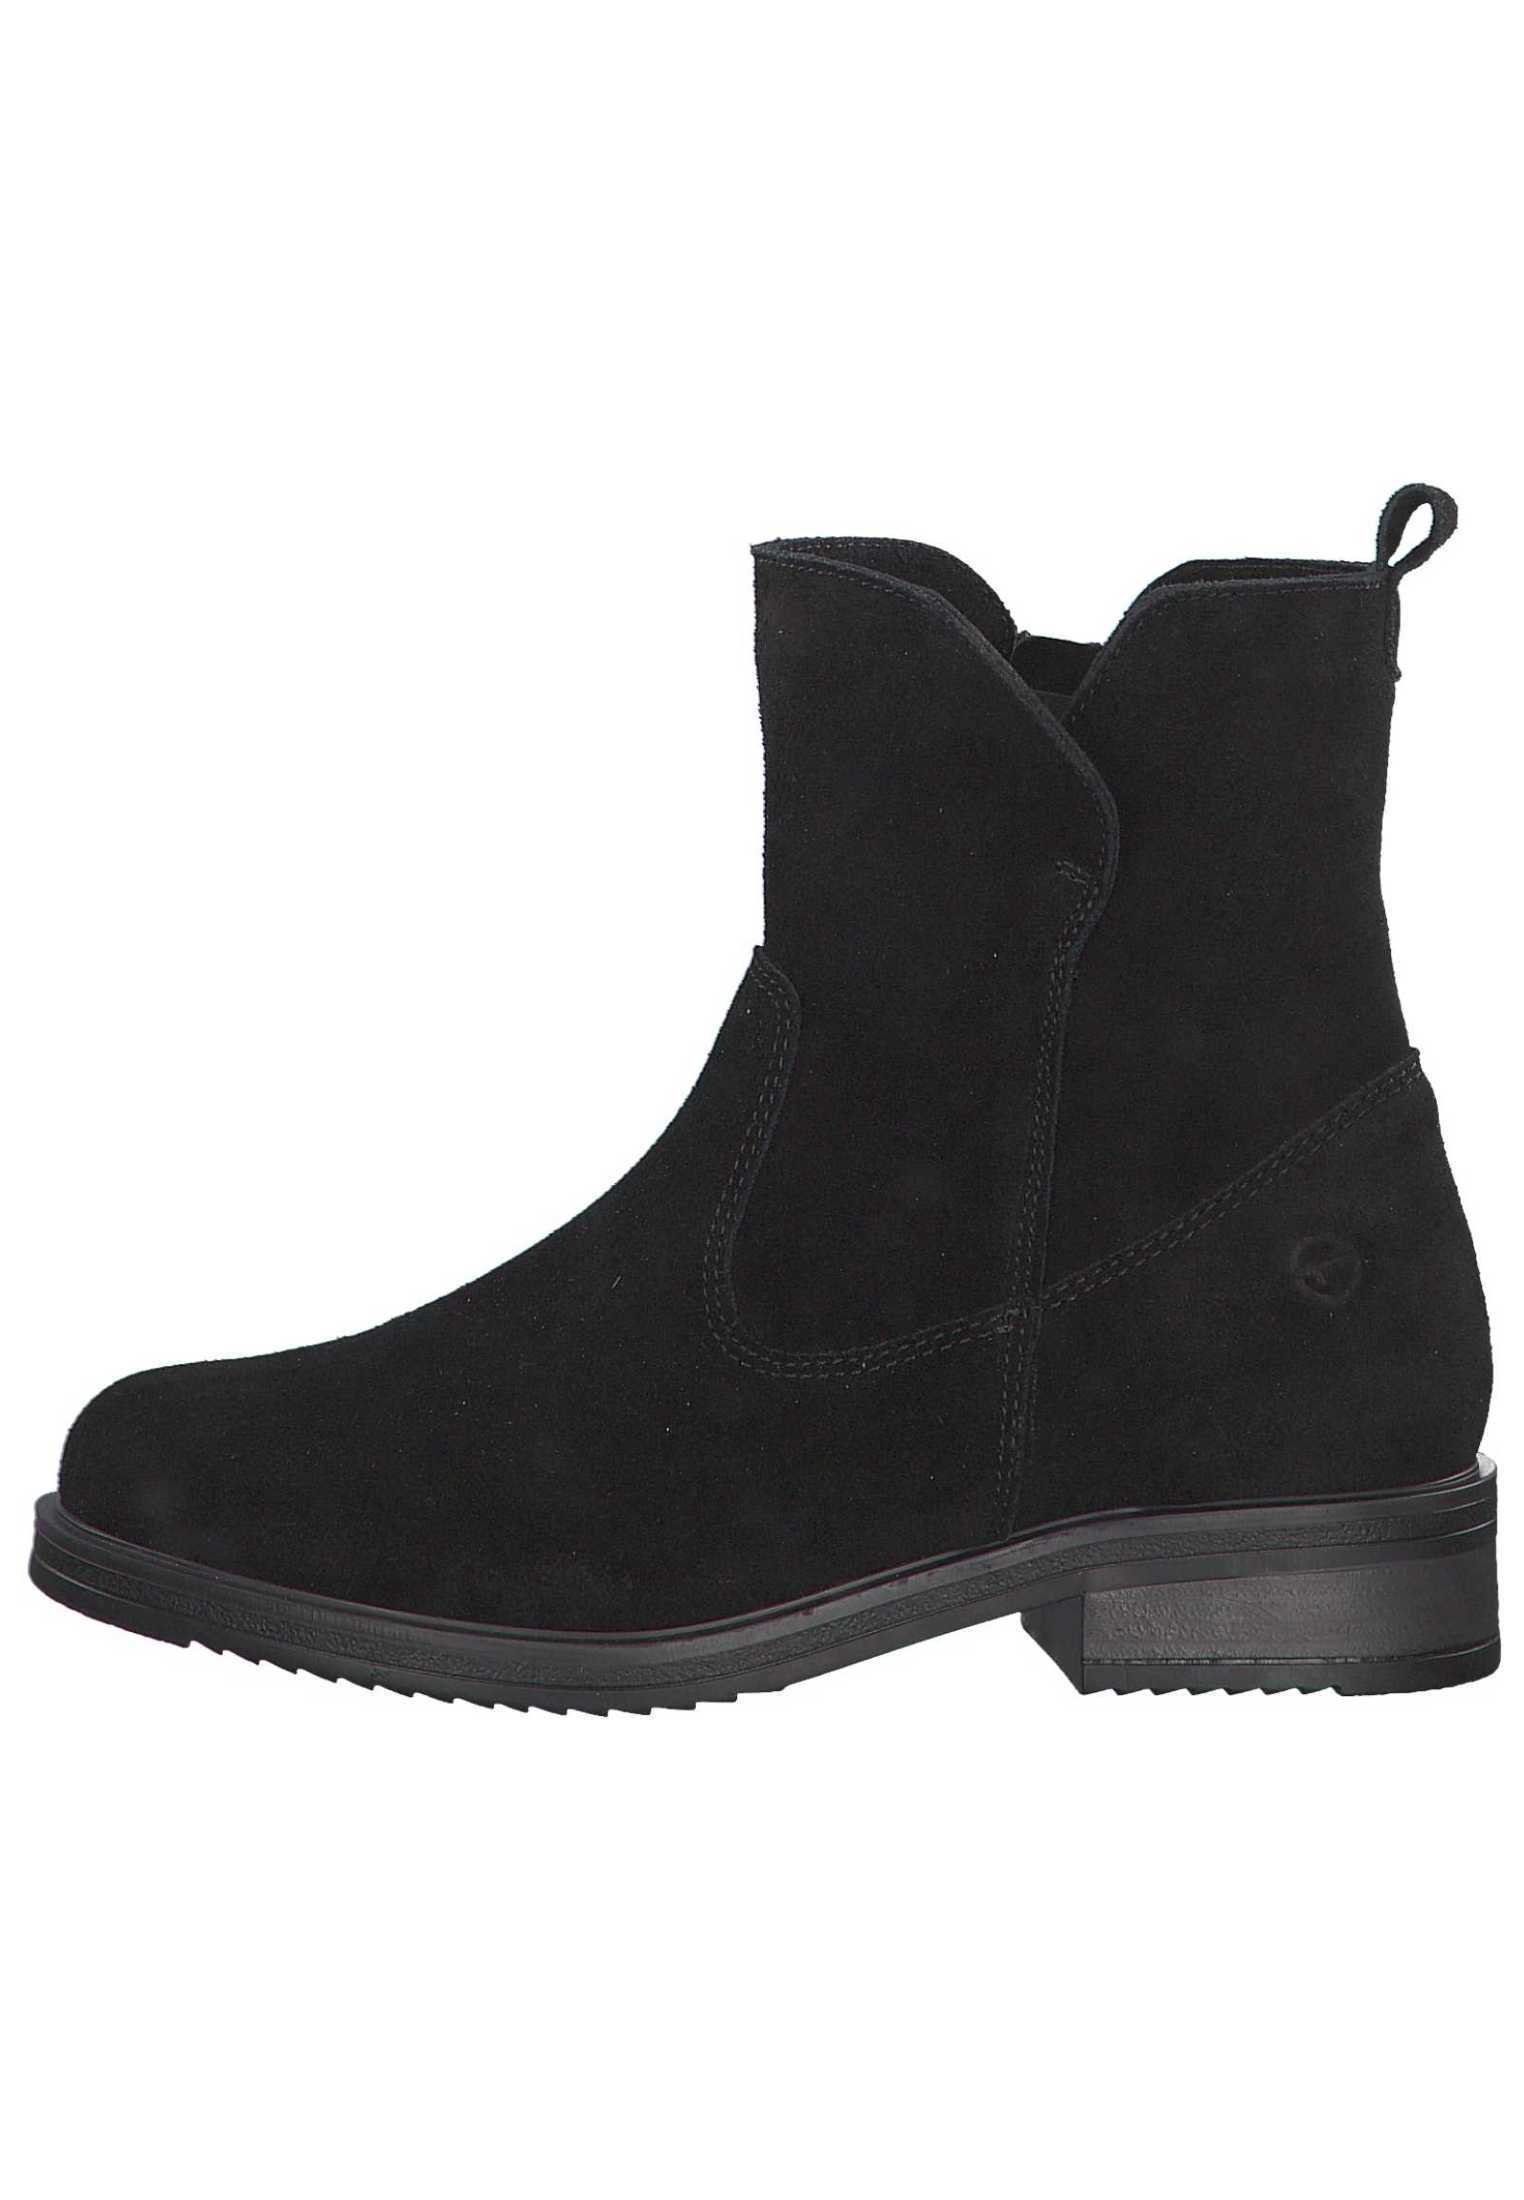 Tamaris Ankelboots - Black 1/svart